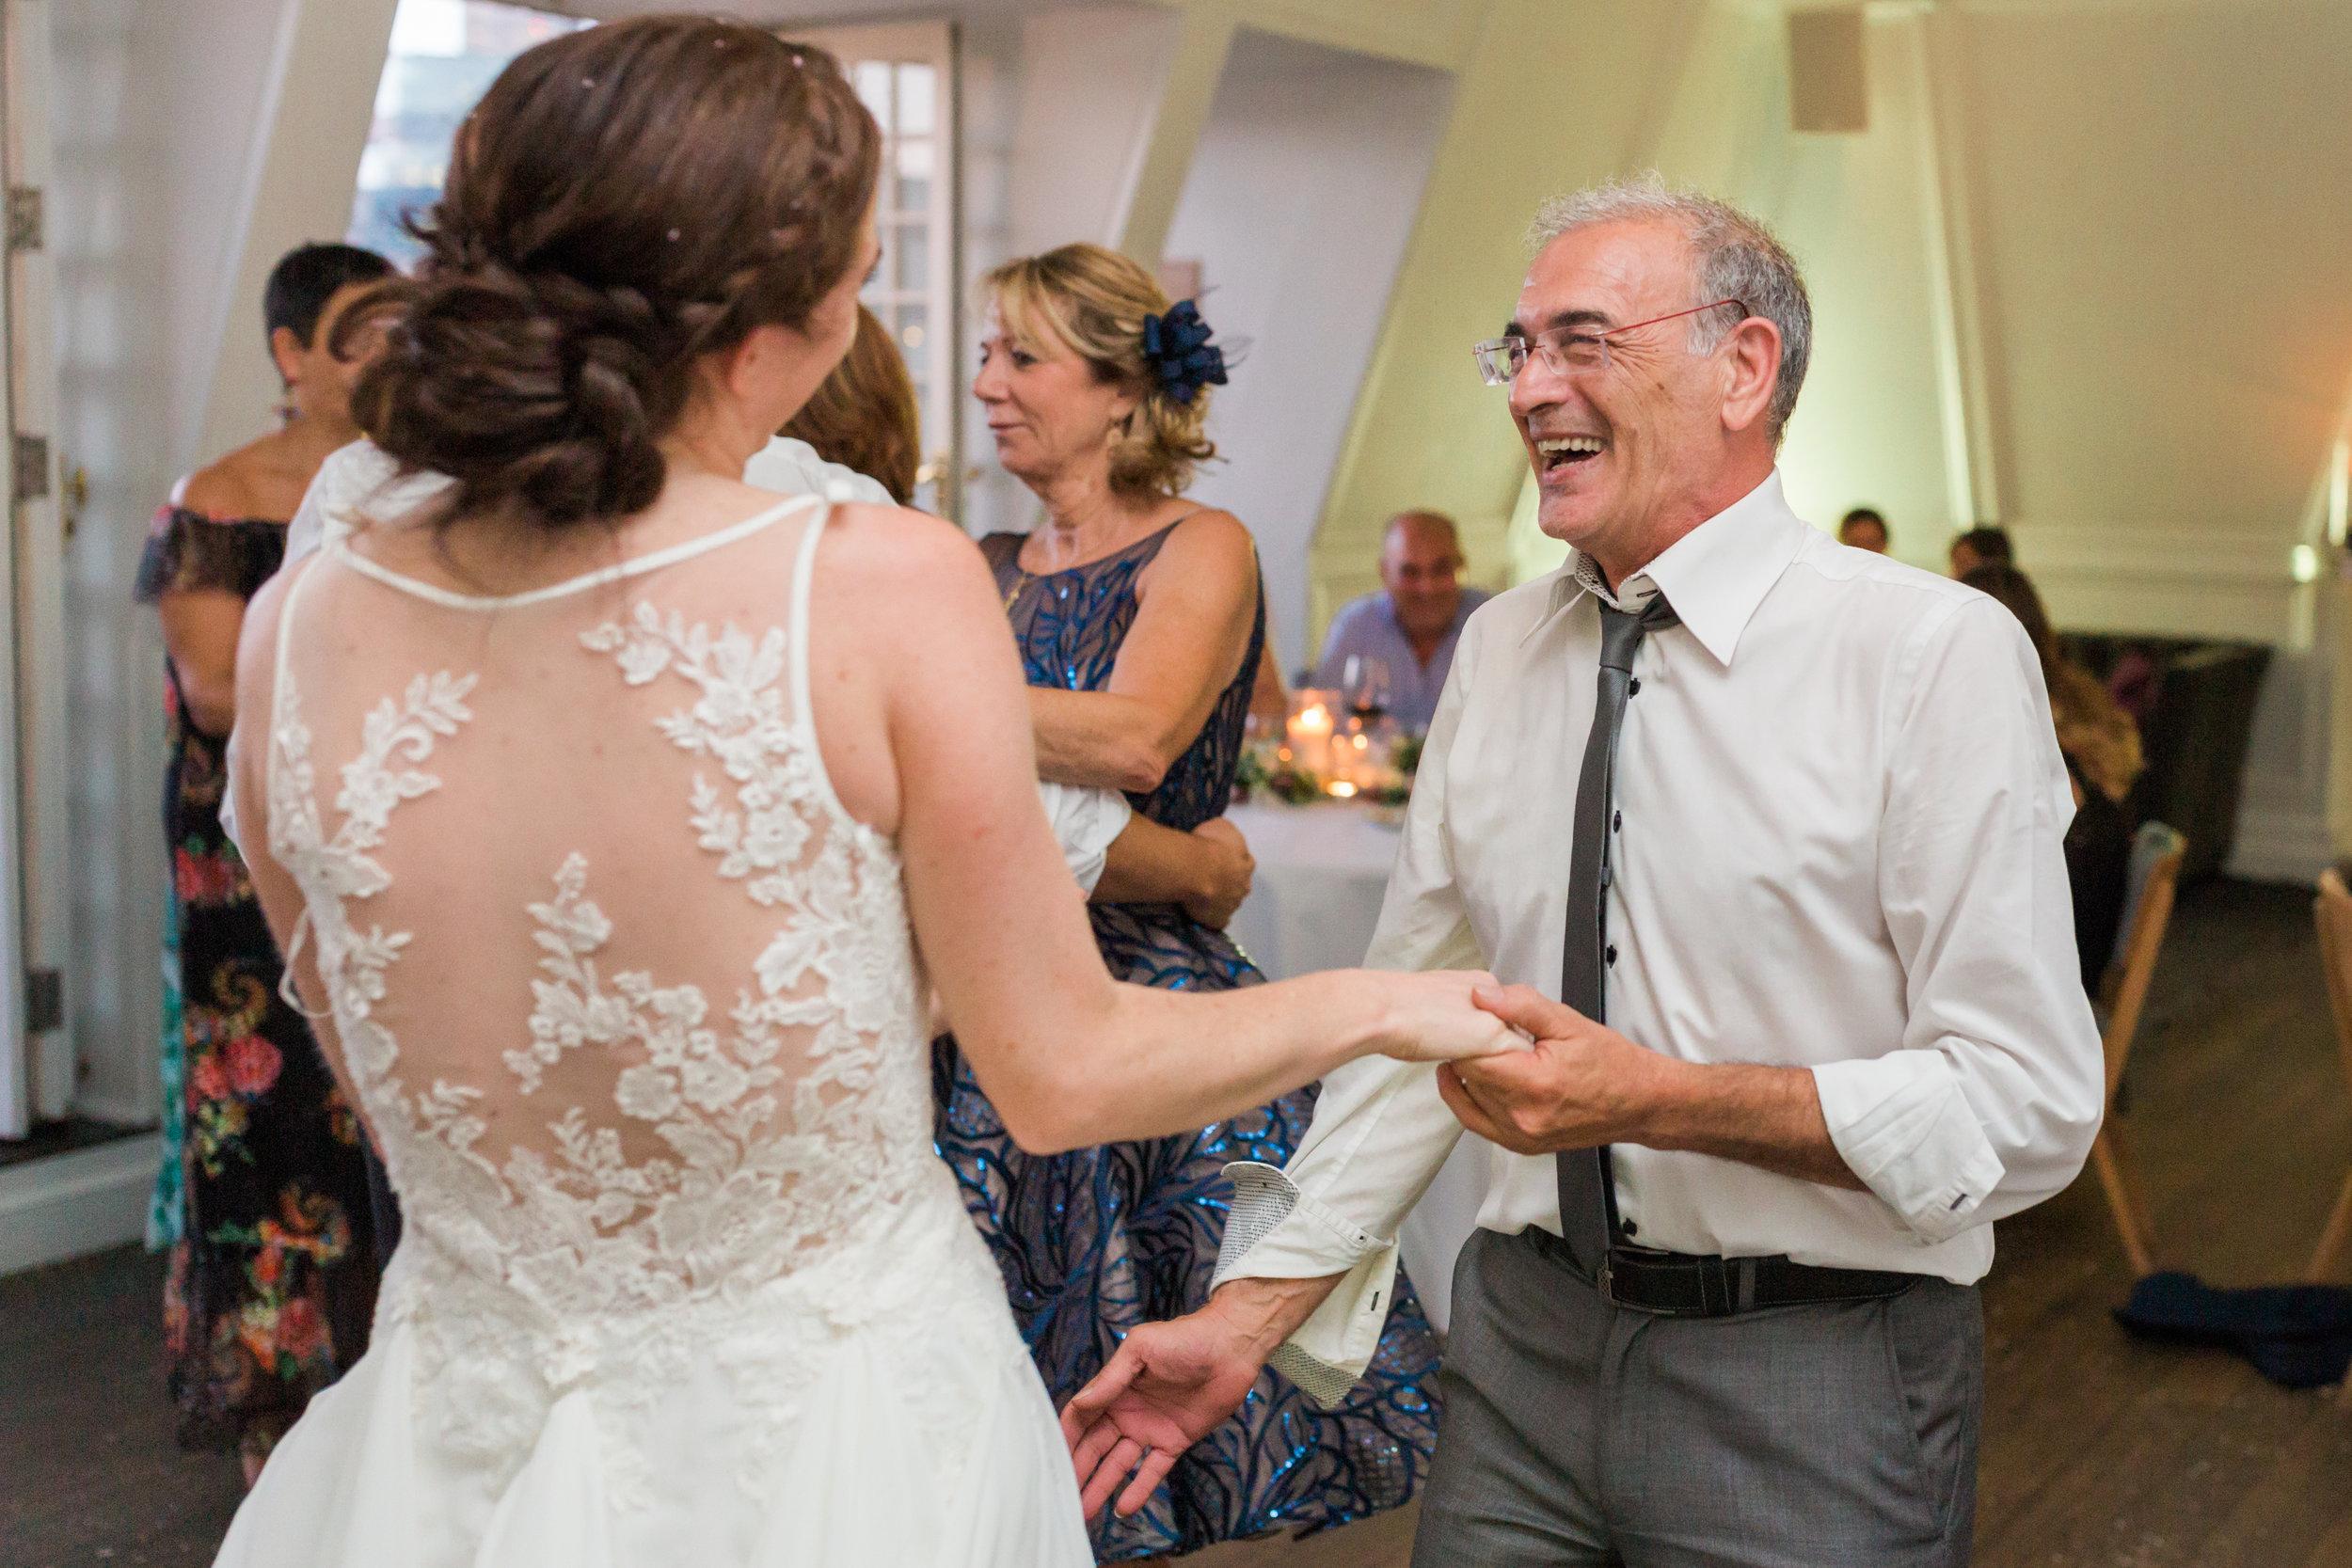 wedding-day-dancing.jpg